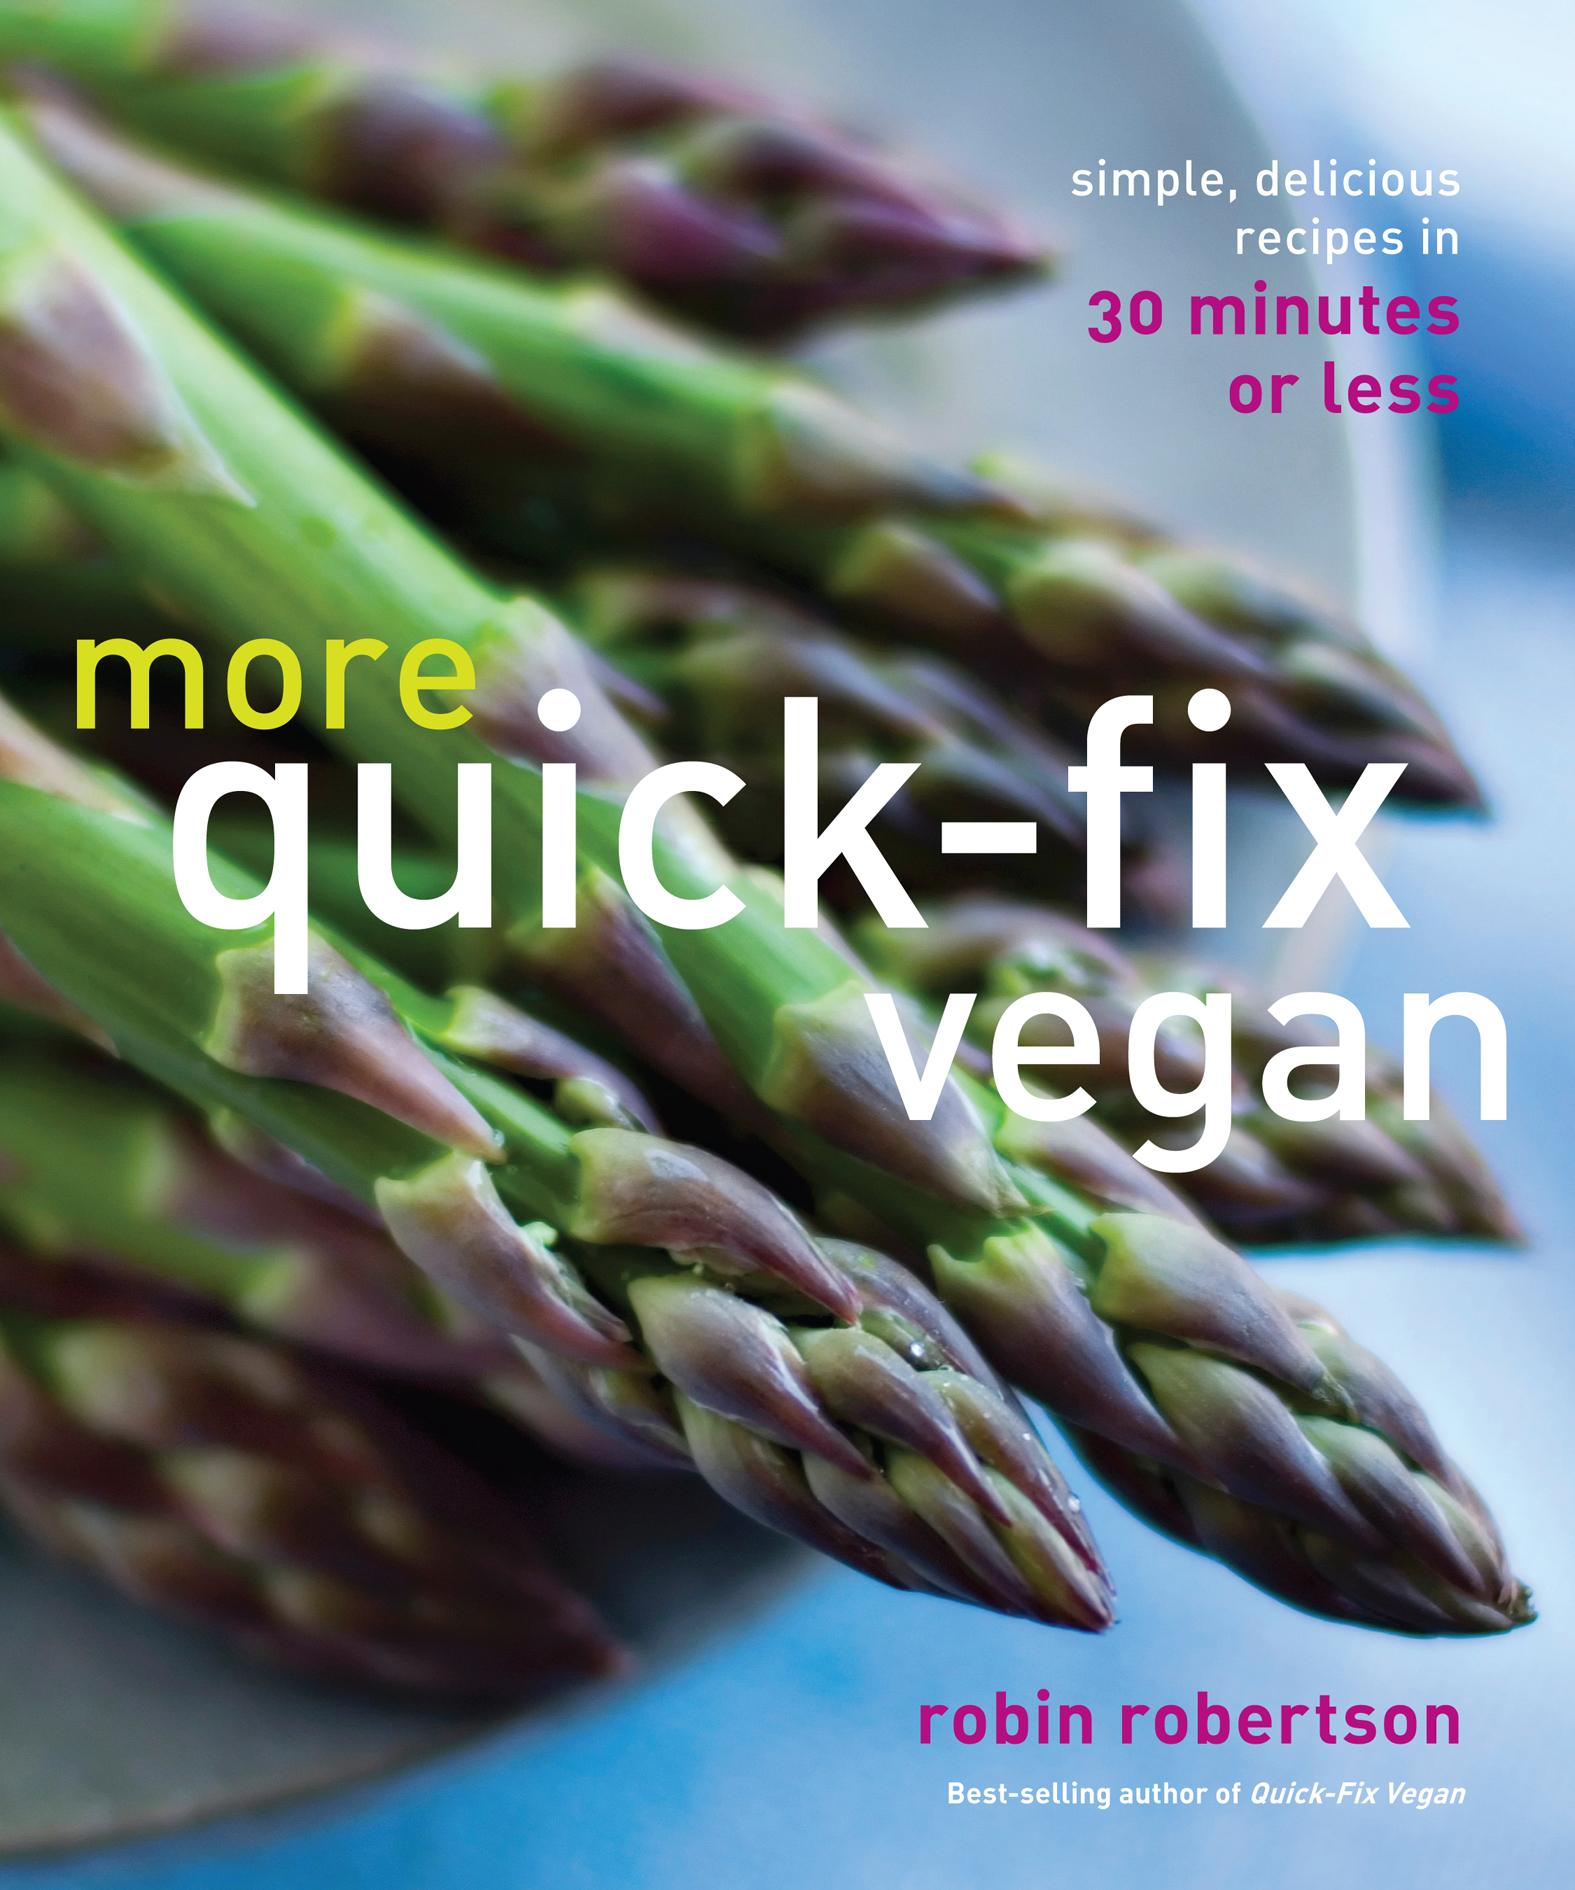 More Quick-Fix Vegan Simple, Delicious Recipes in 30 Minutes or Less